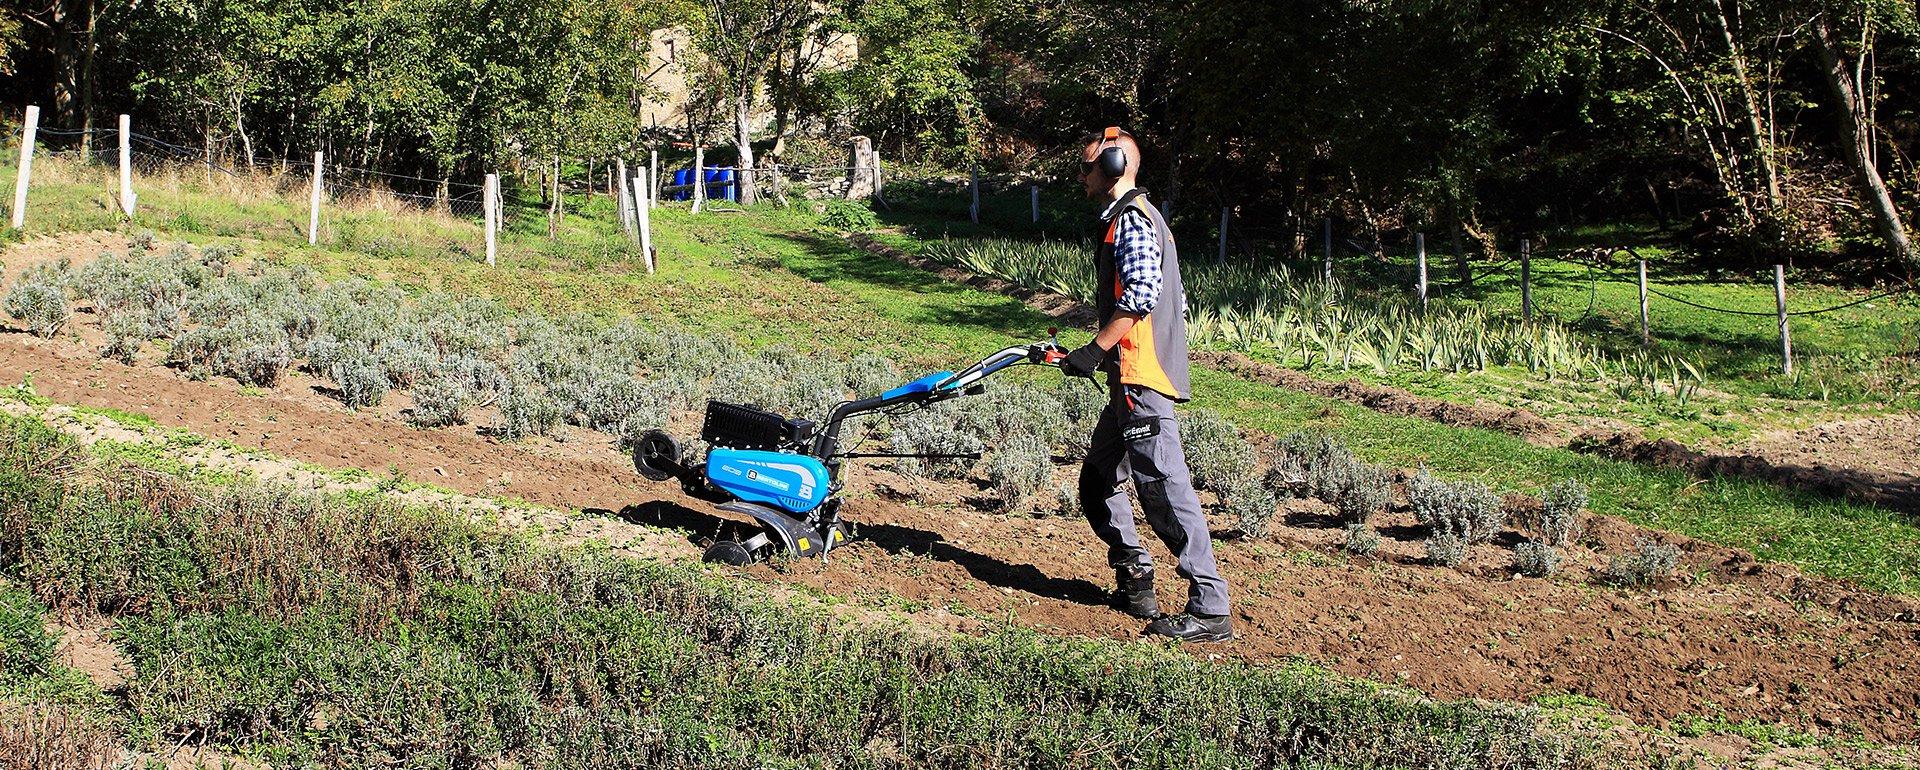 Bertolini: Products for the care of Green Areas - Bertolini